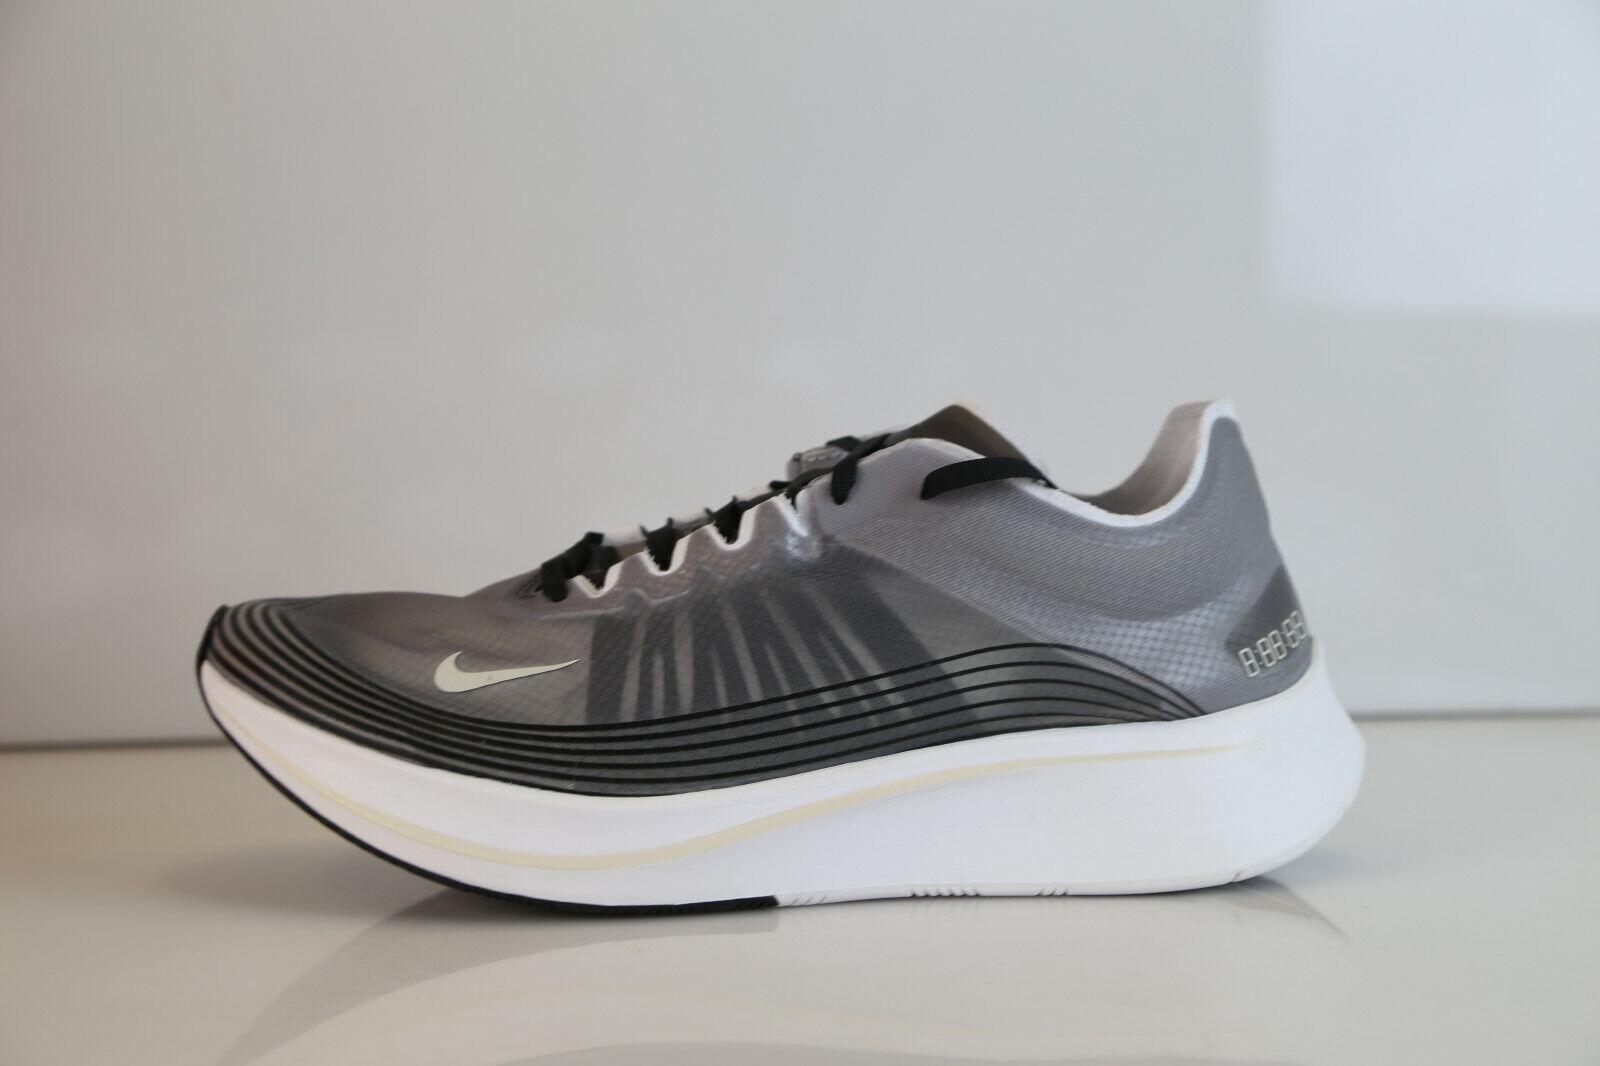 Nike Zoom Fly SP Black Light Bone AJ9282-001 9-13